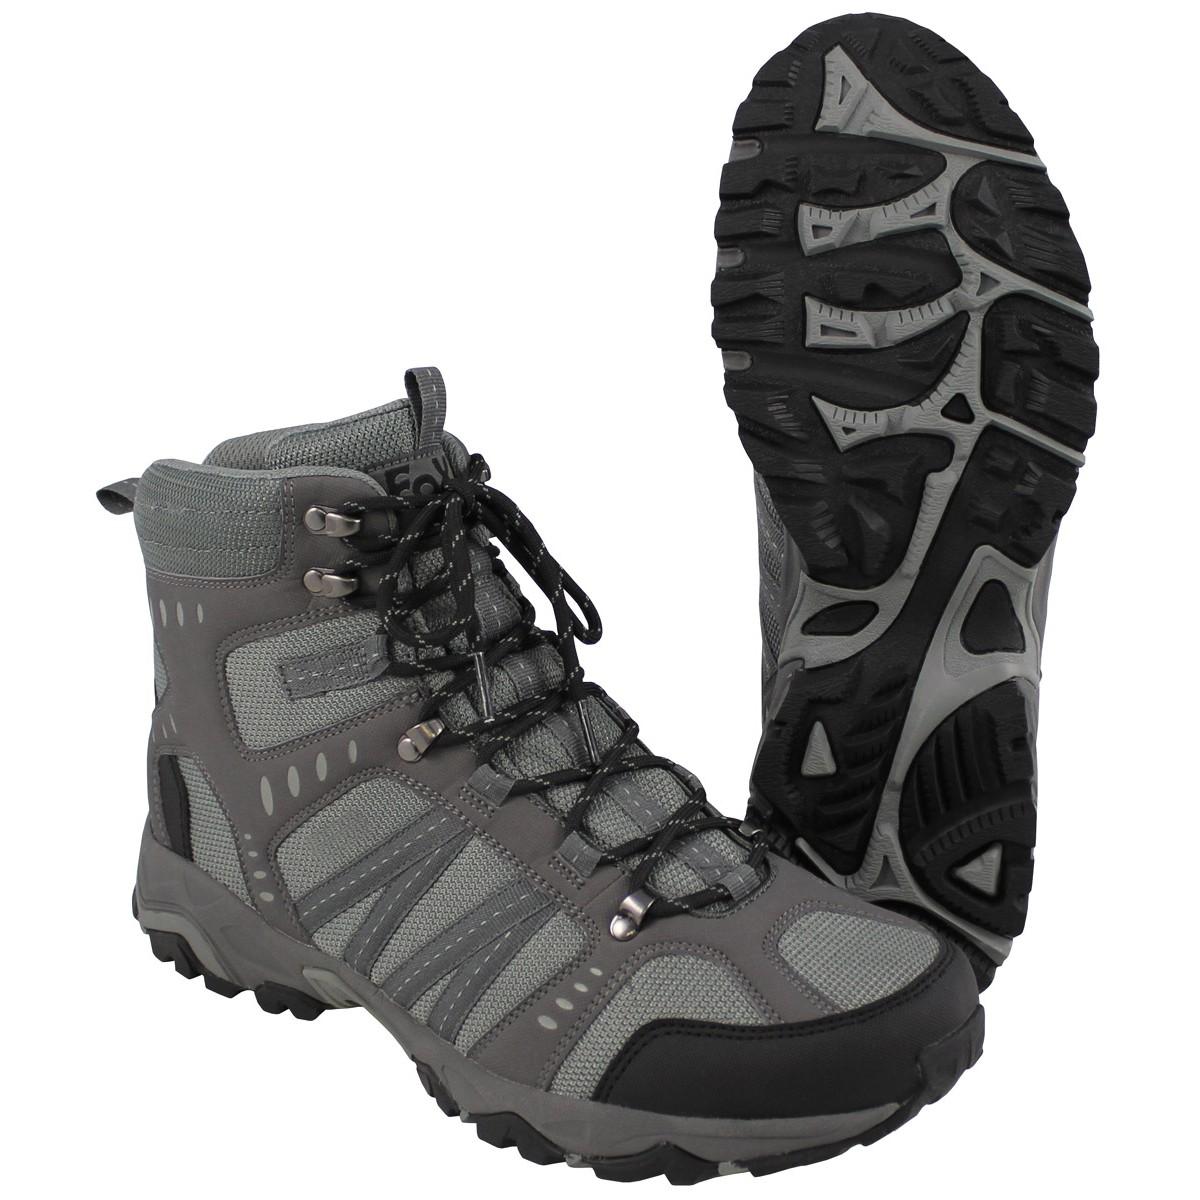 Borbene cizme Tactical sive